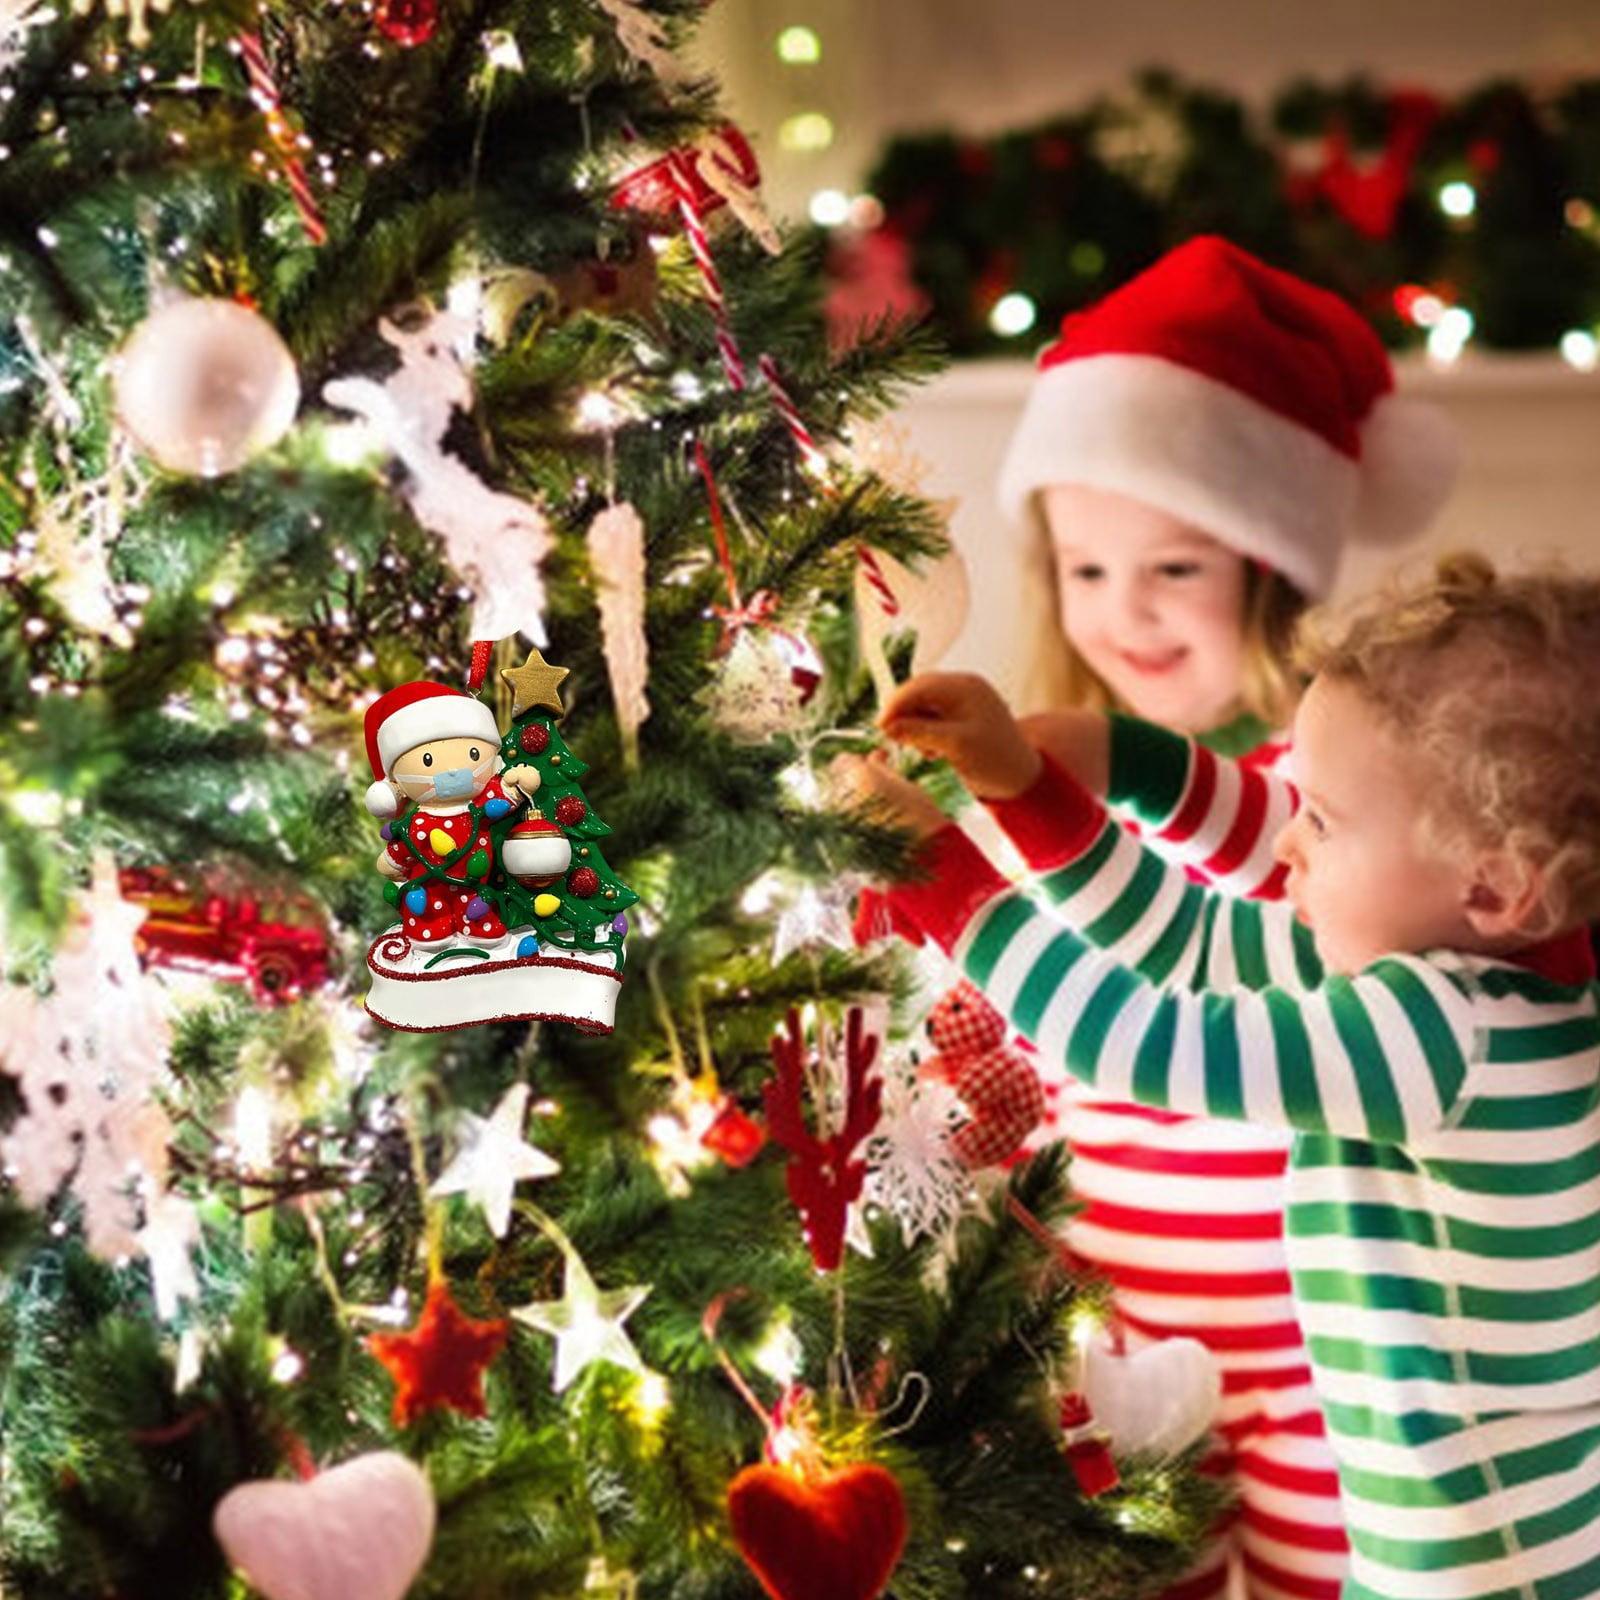 Vanlofe 2020 Christmas Tree Decorations Christmas Ornament Santa Claus Baby Walmart Com Walmart Com